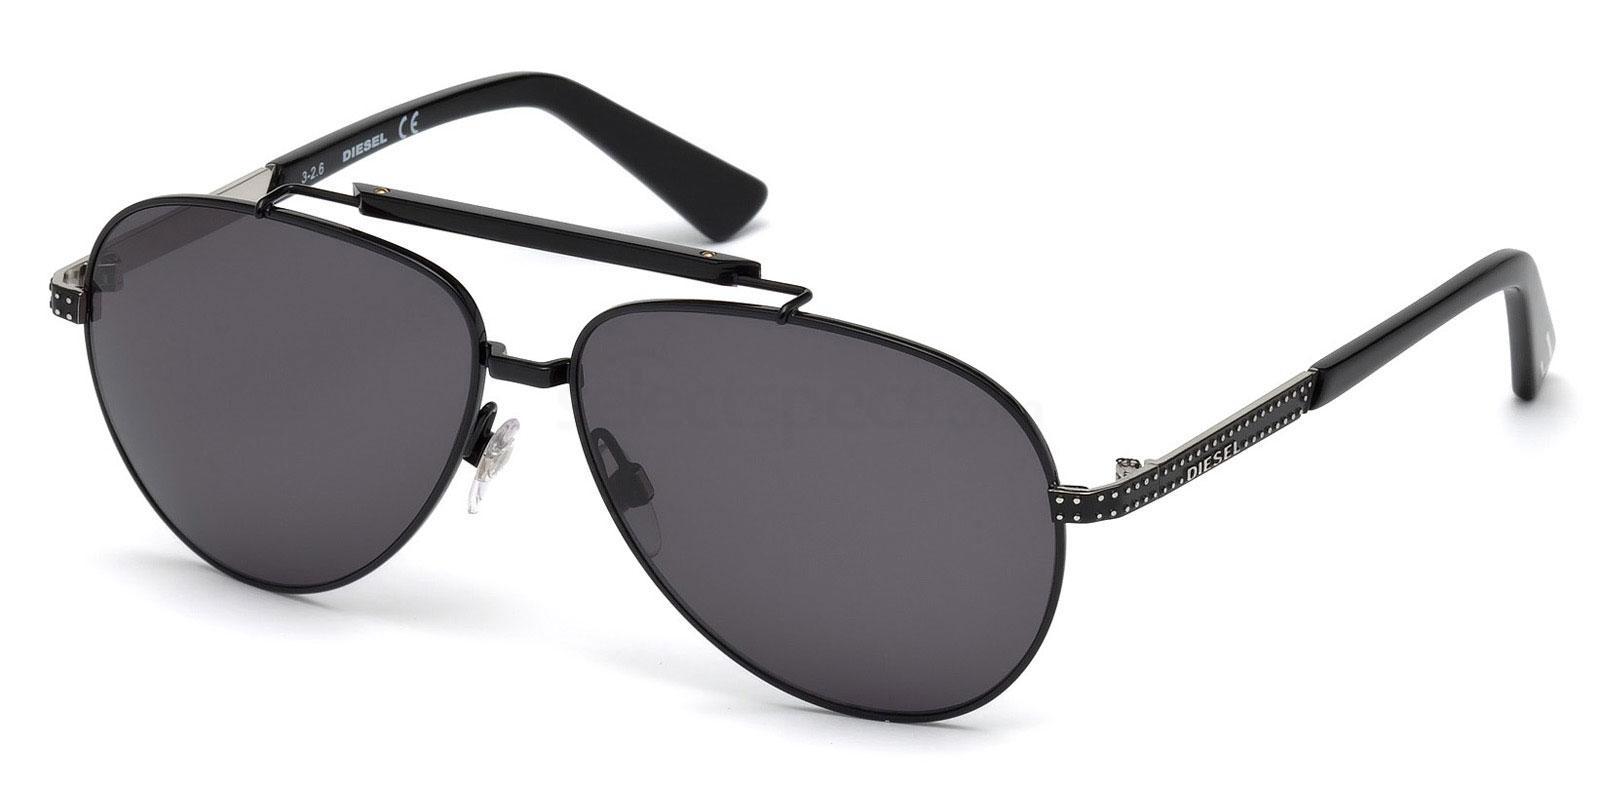 01A DL0238 Sunglasses, Diesel